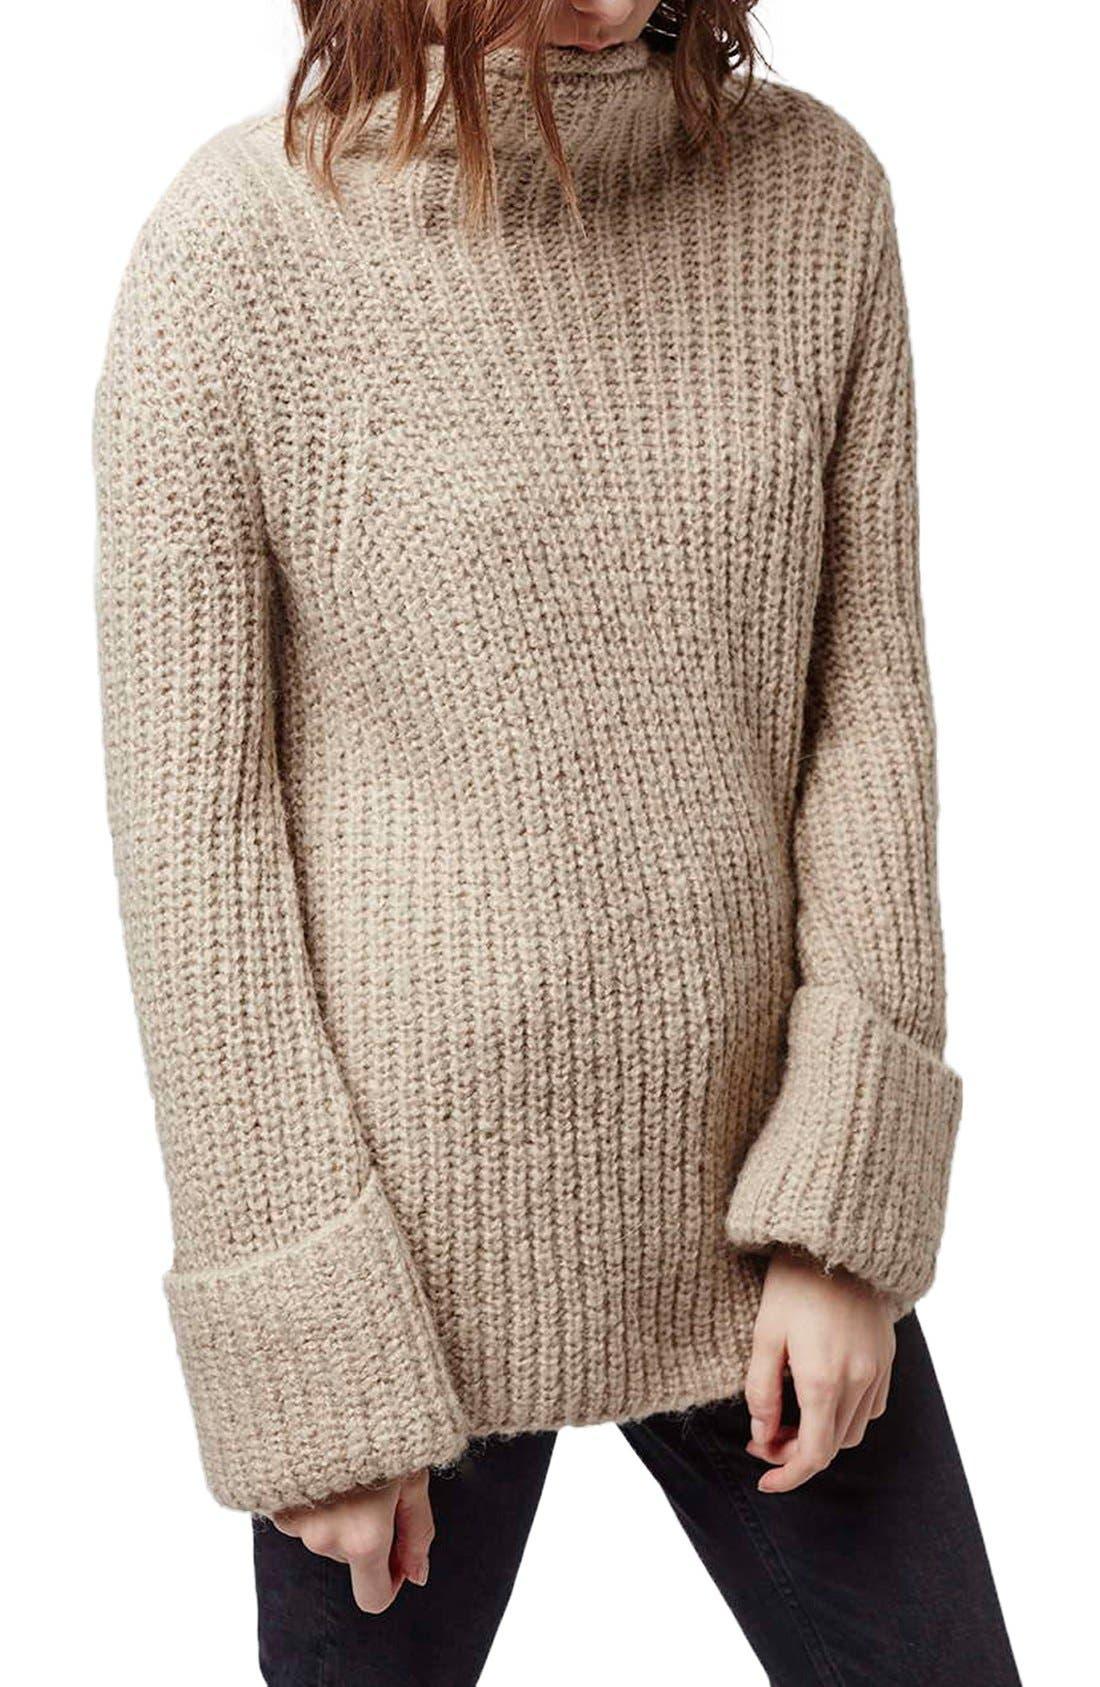 Main Image - Topshop 'Jumbo' Funnel Neck Sweater